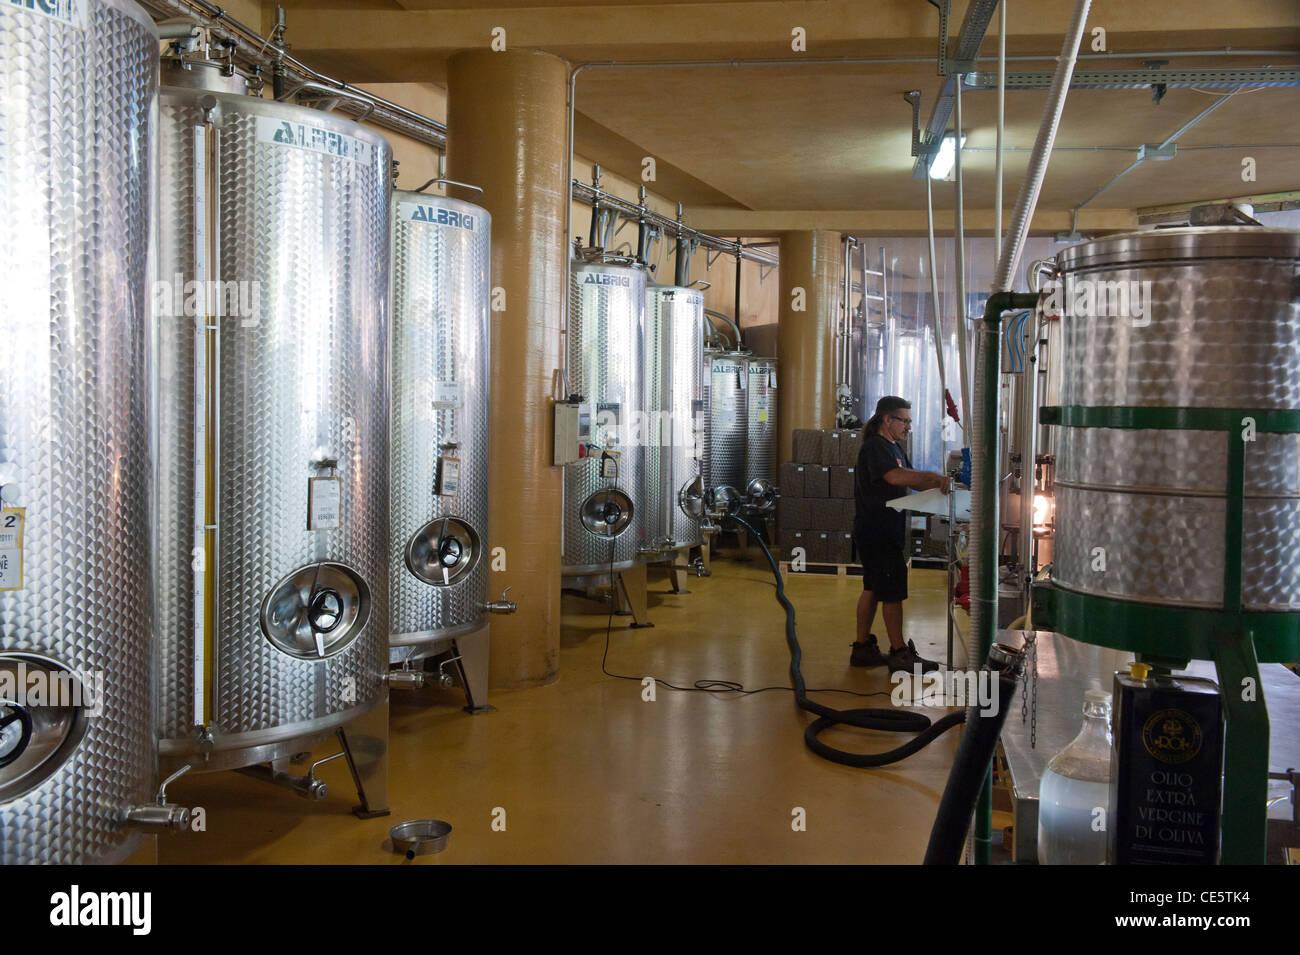 The Roi di Badalucco olive oil mill, Badalucco  Liguria